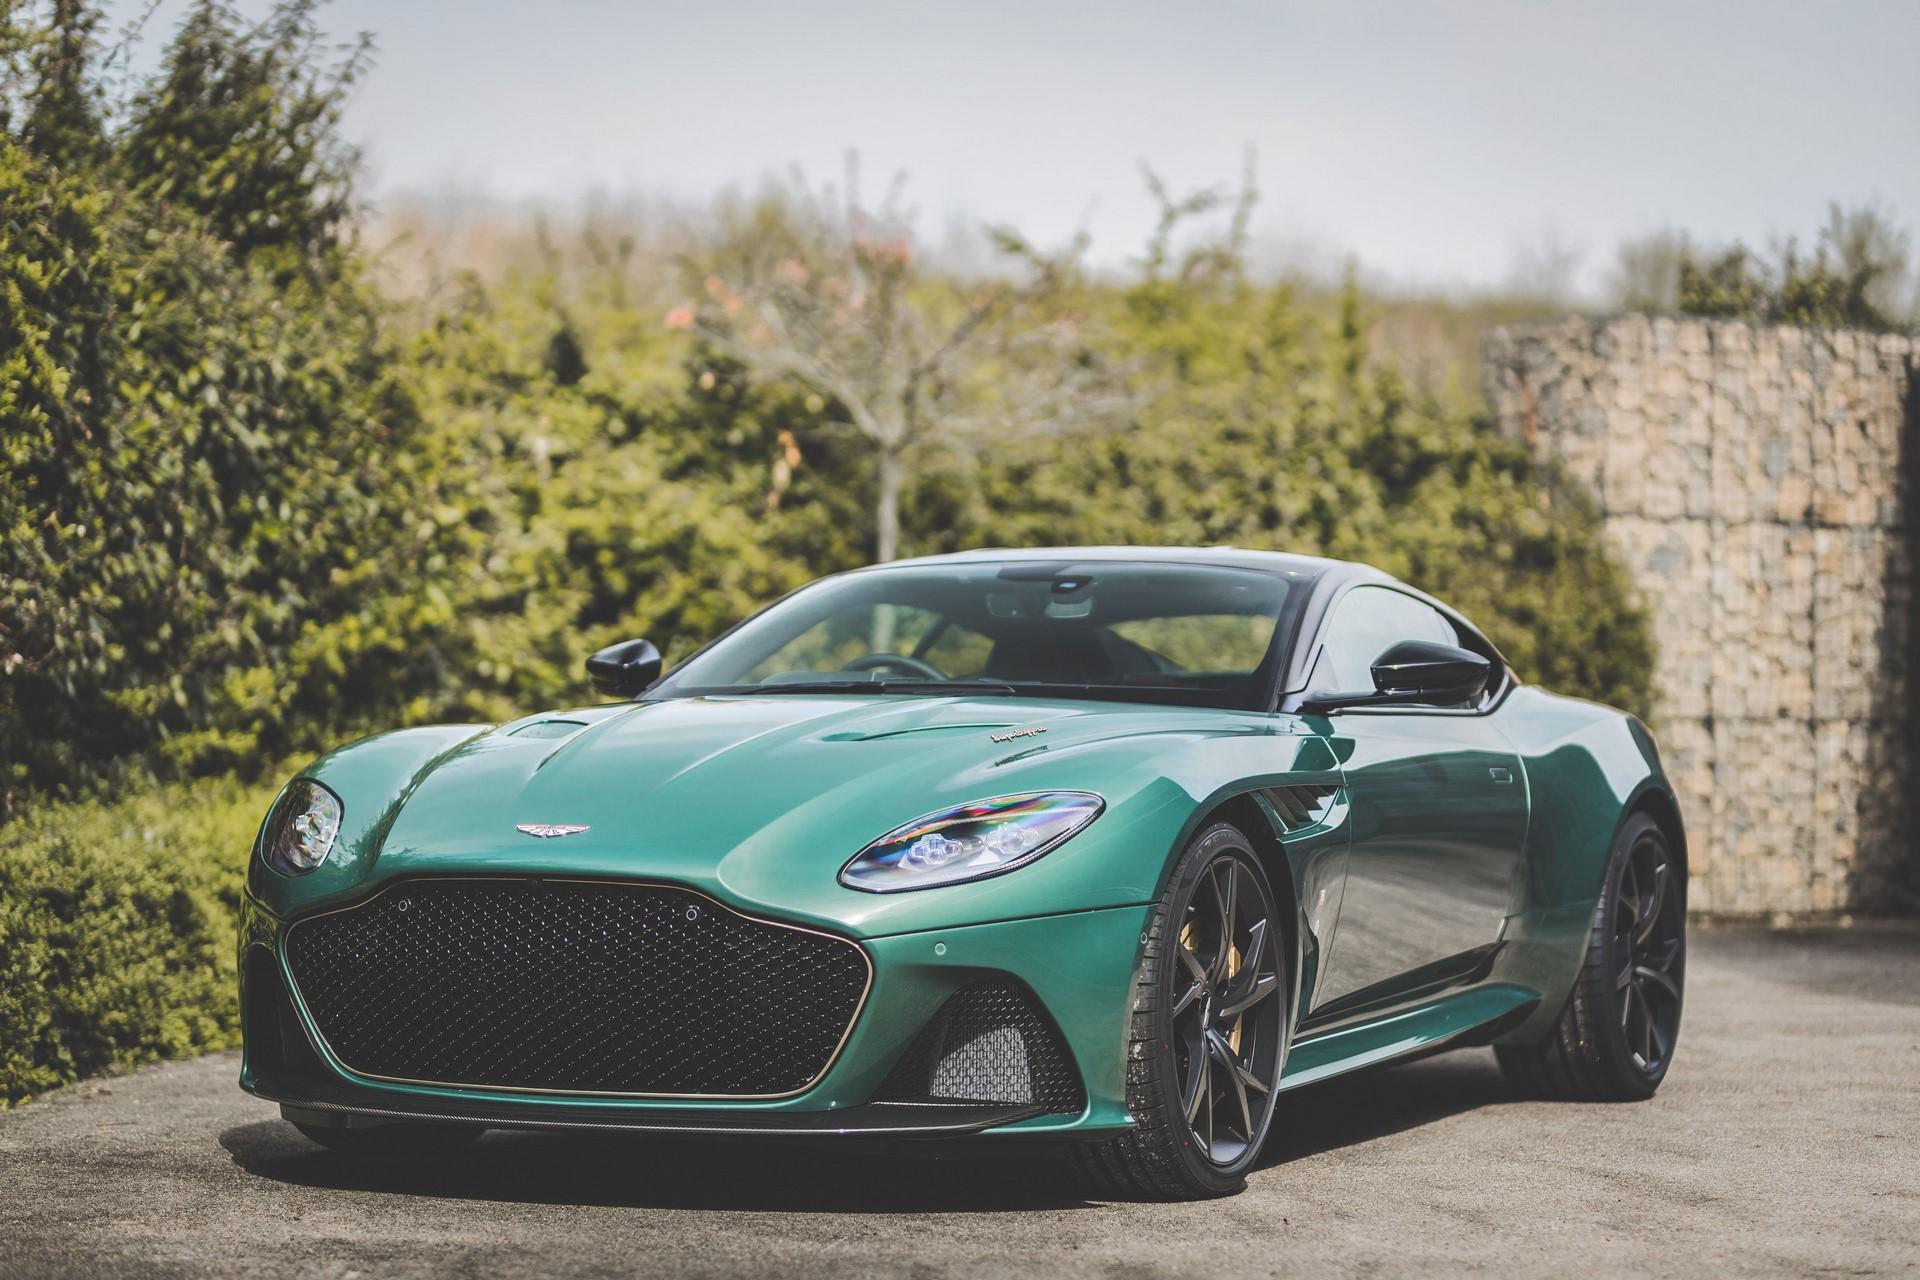 Aston-Martin-DBS-59-Edition-1